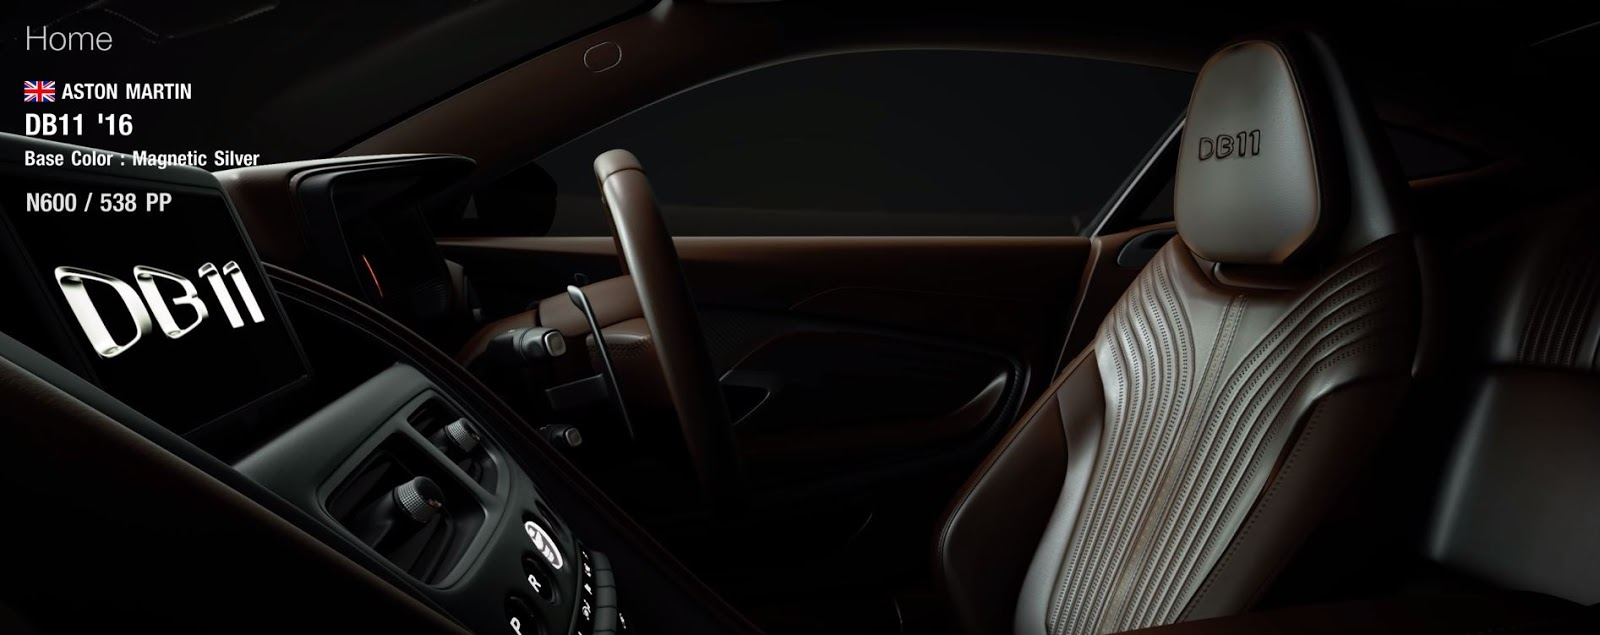 Intérieur Gran Turismo 7 Aston Martin DB11